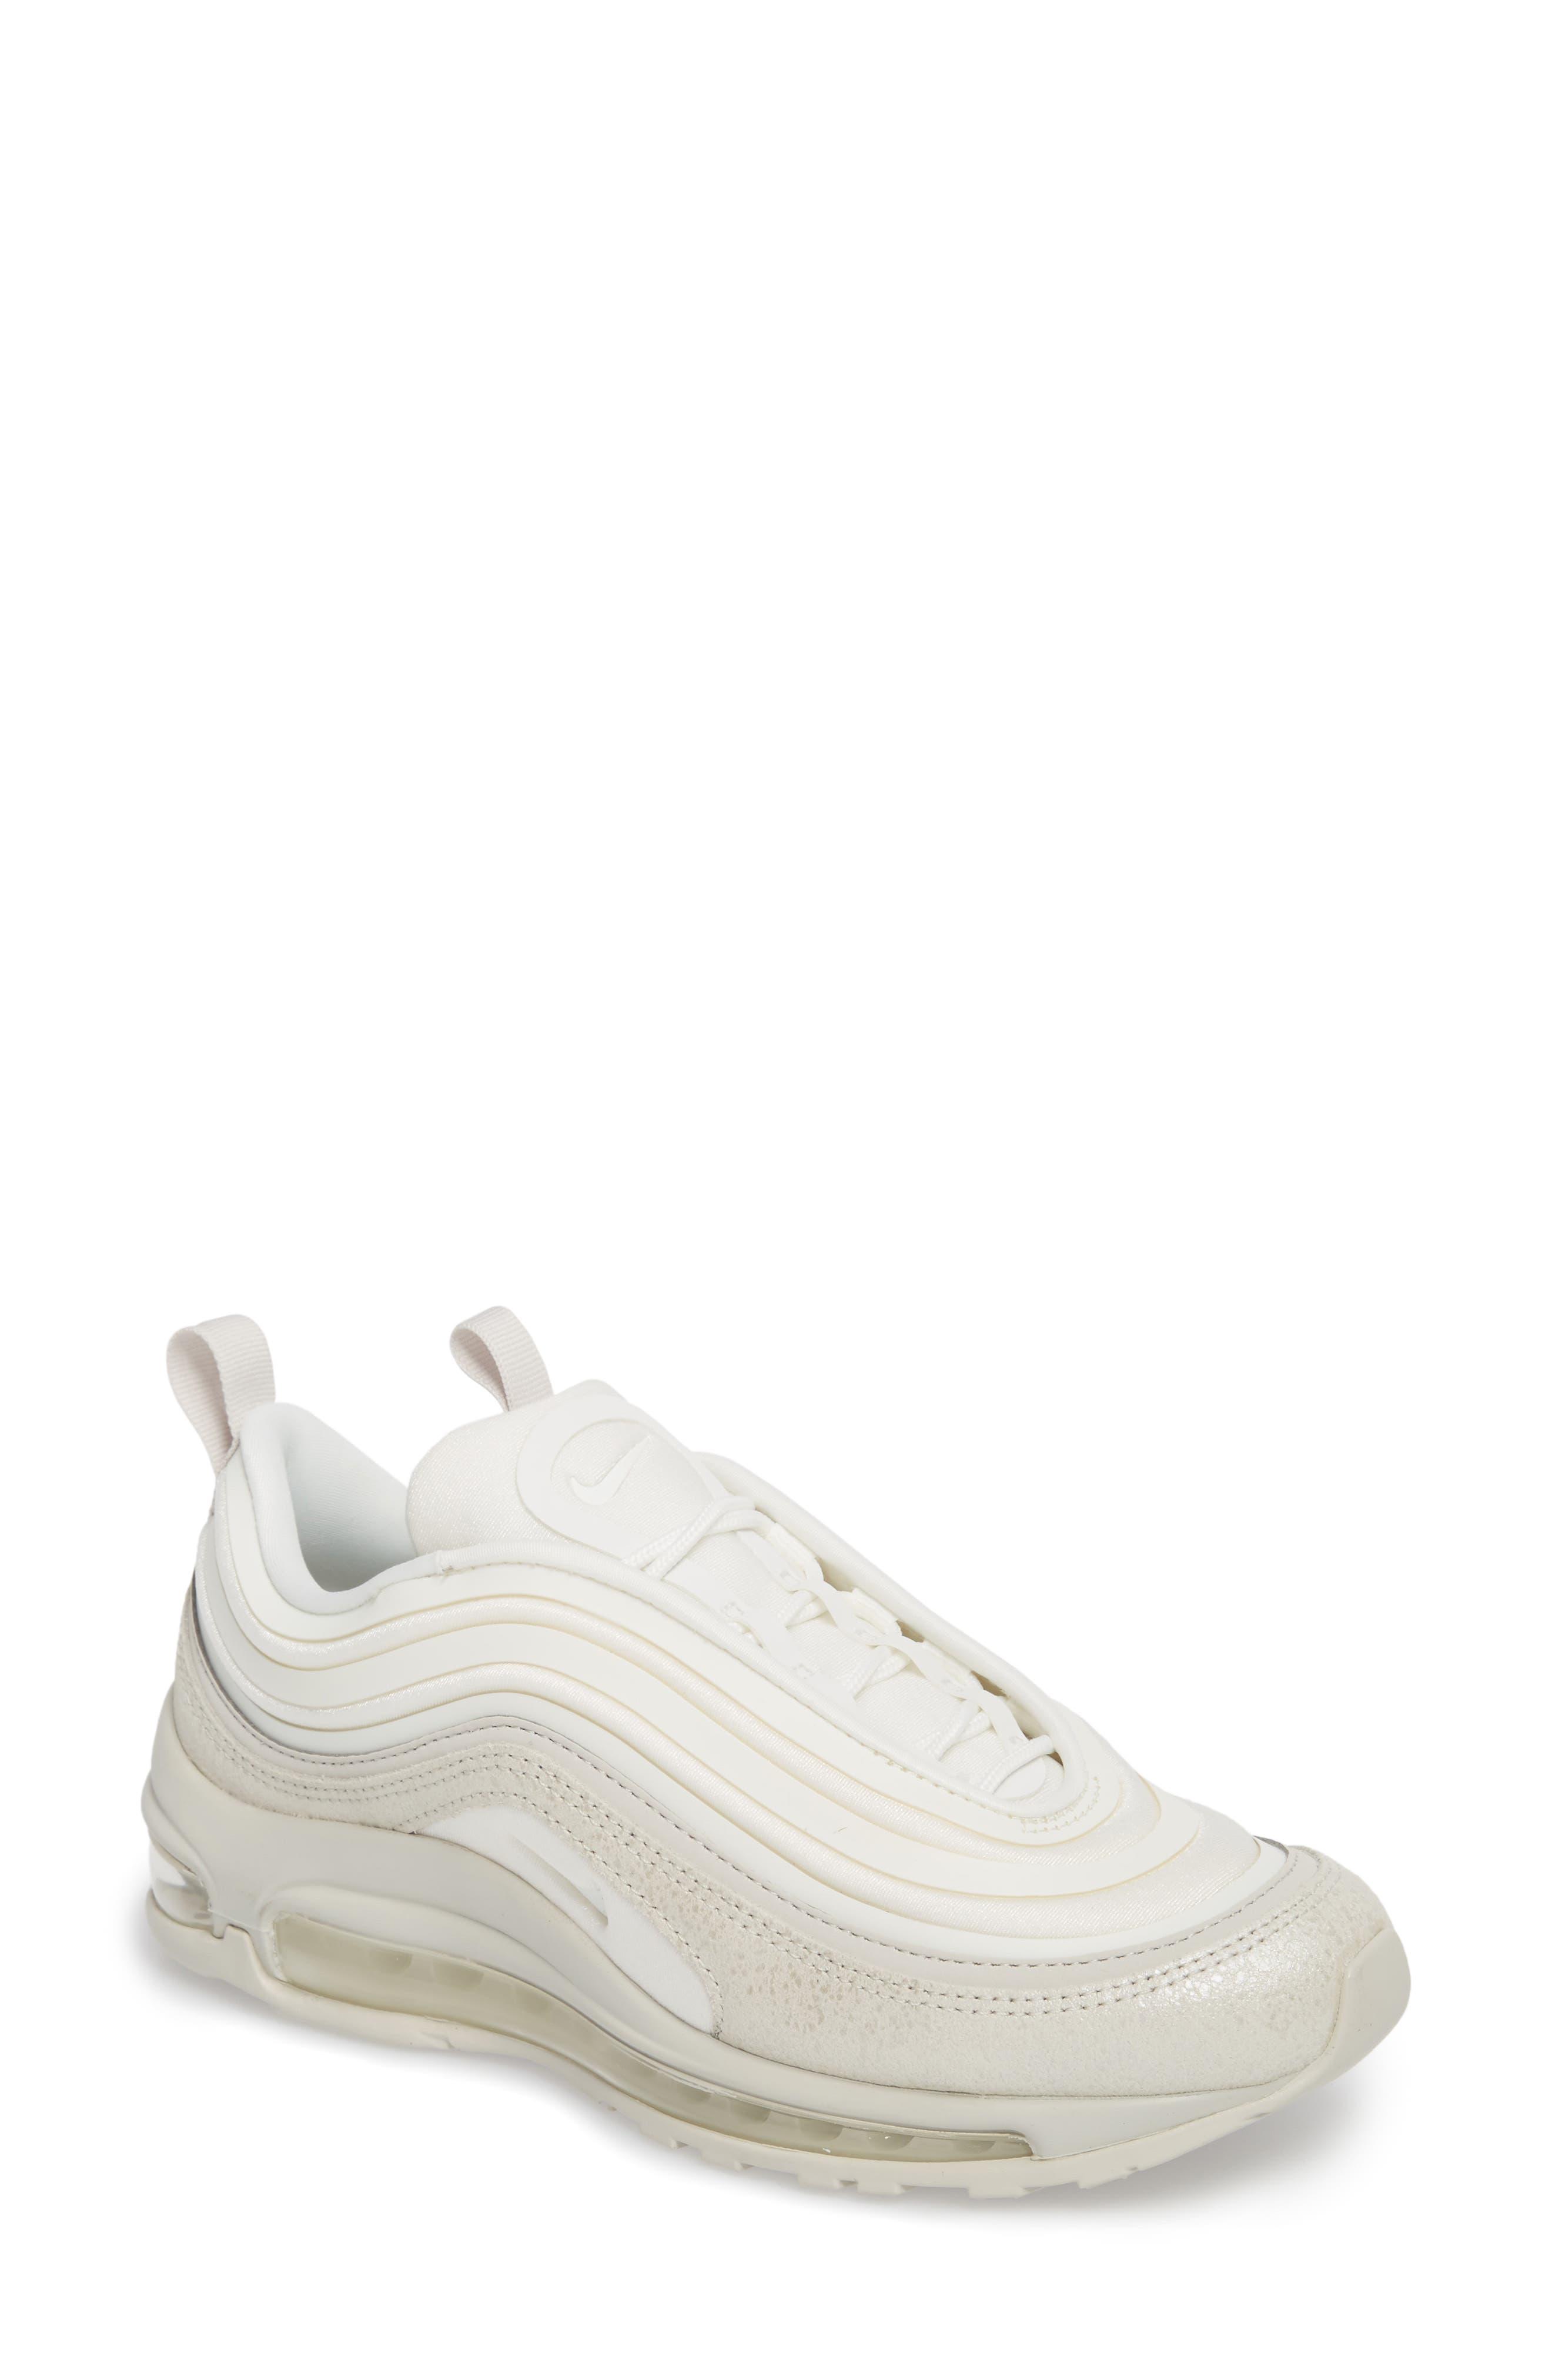 Air Max 97 Ultra '17 SE Sneaker,                             Main thumbnail 6, color,